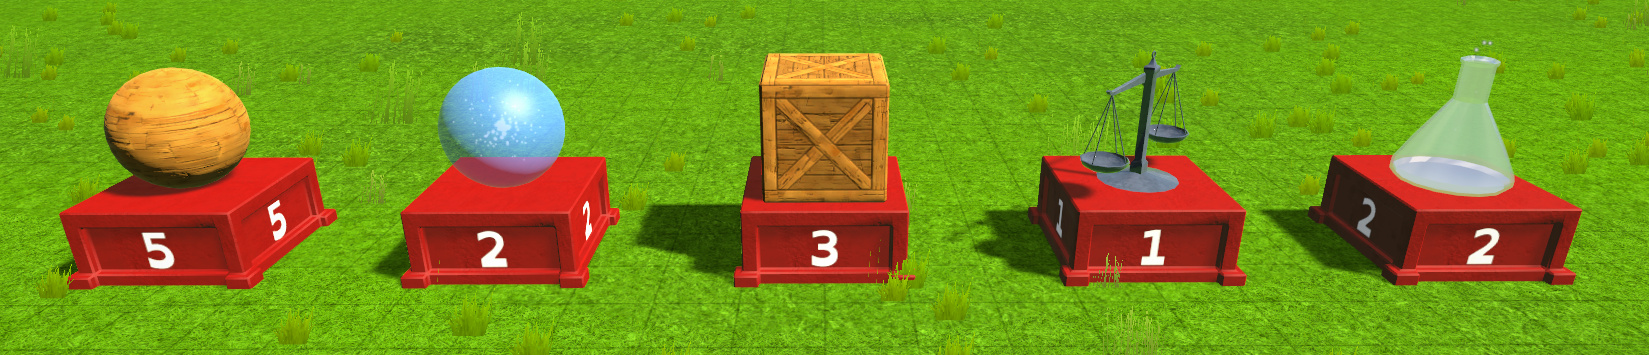 multiplayer blocks